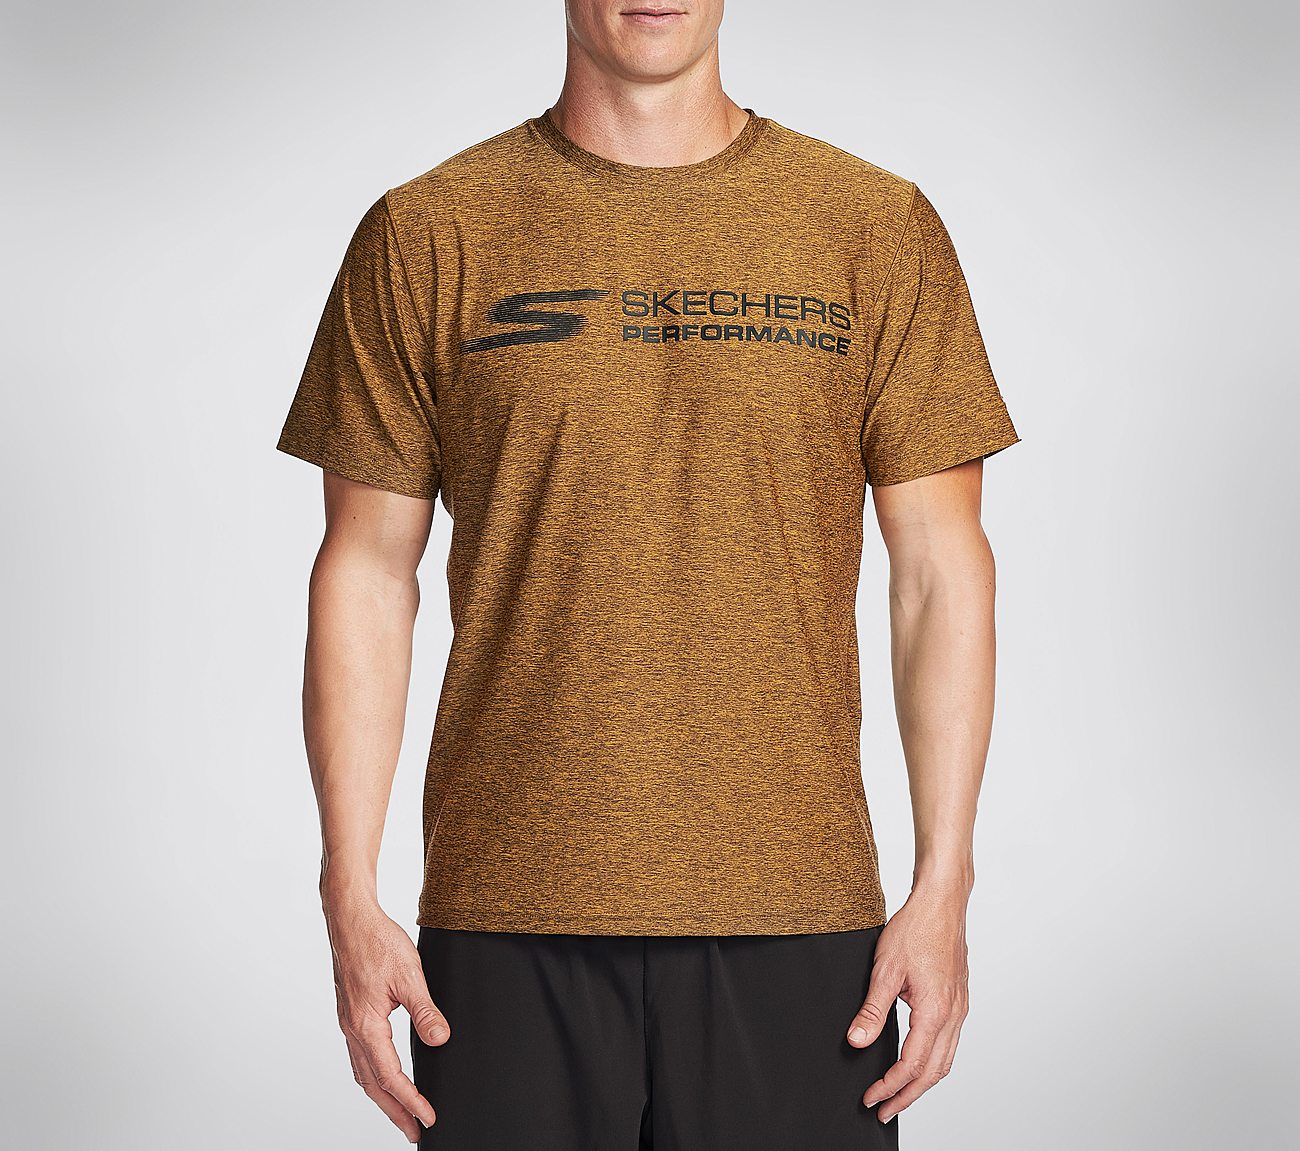 Buy SKECHERS Performance Crew Tee Shirt